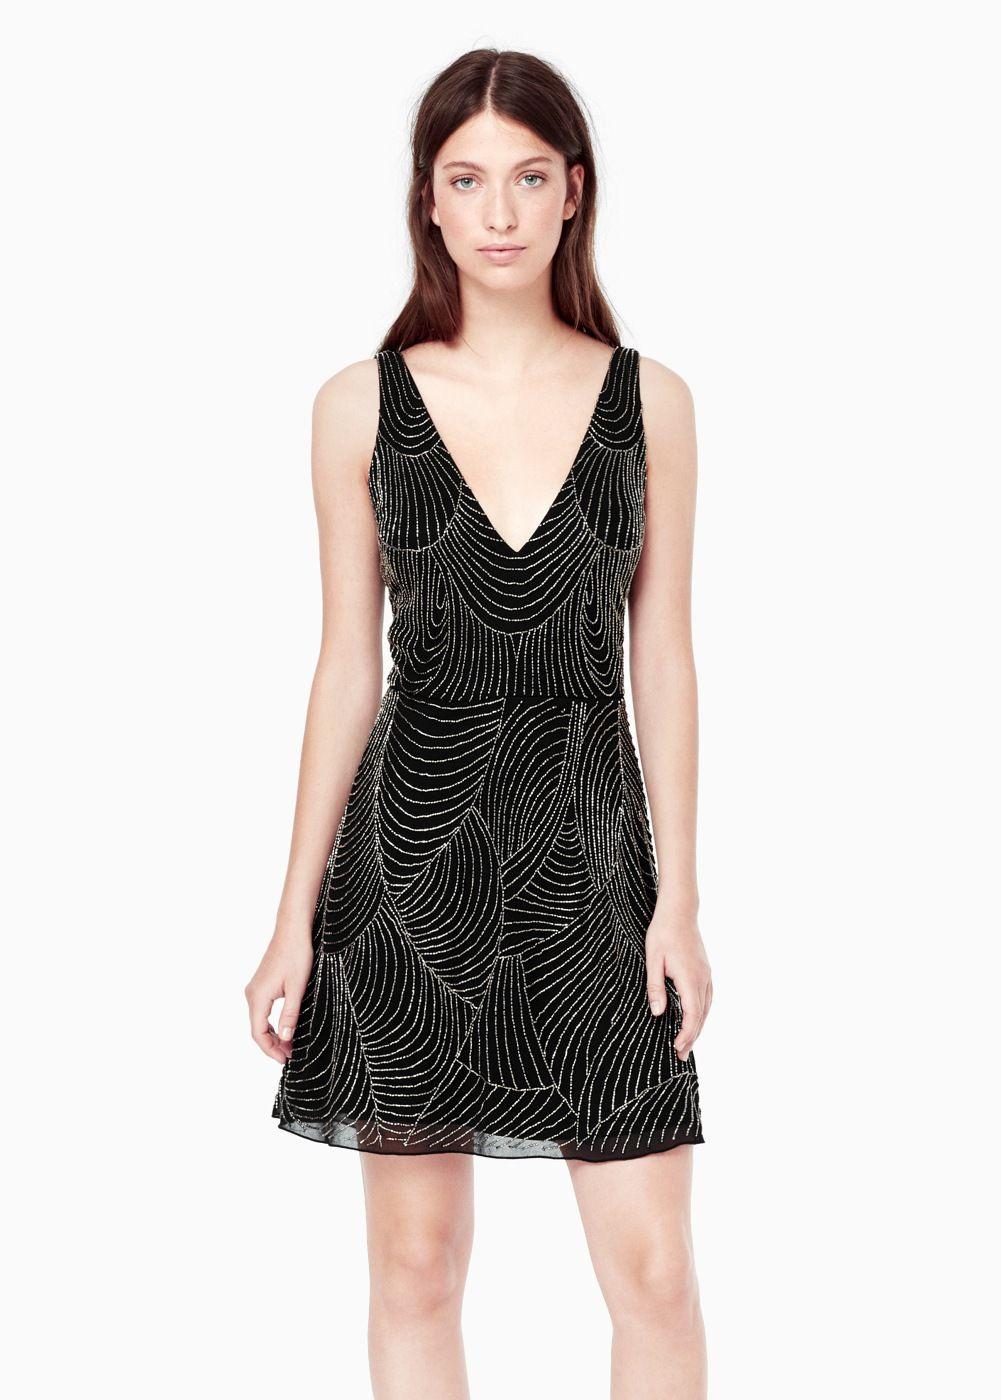 Vestido abalorios bordados - Mujer | Besticken, Mango und Für damen